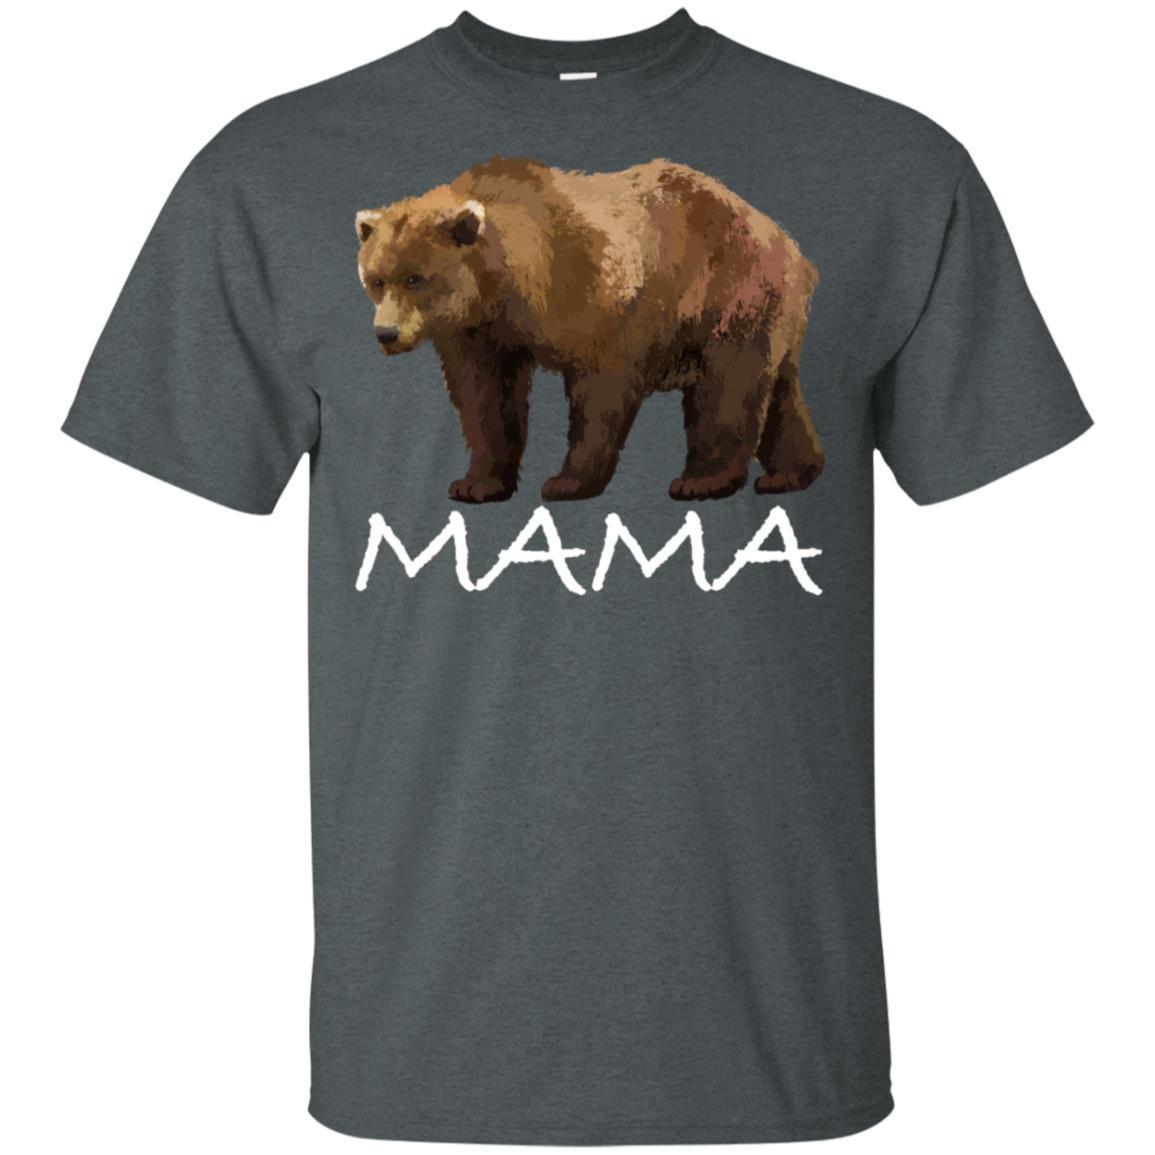 Mama Bear Unisex Short Sleeve